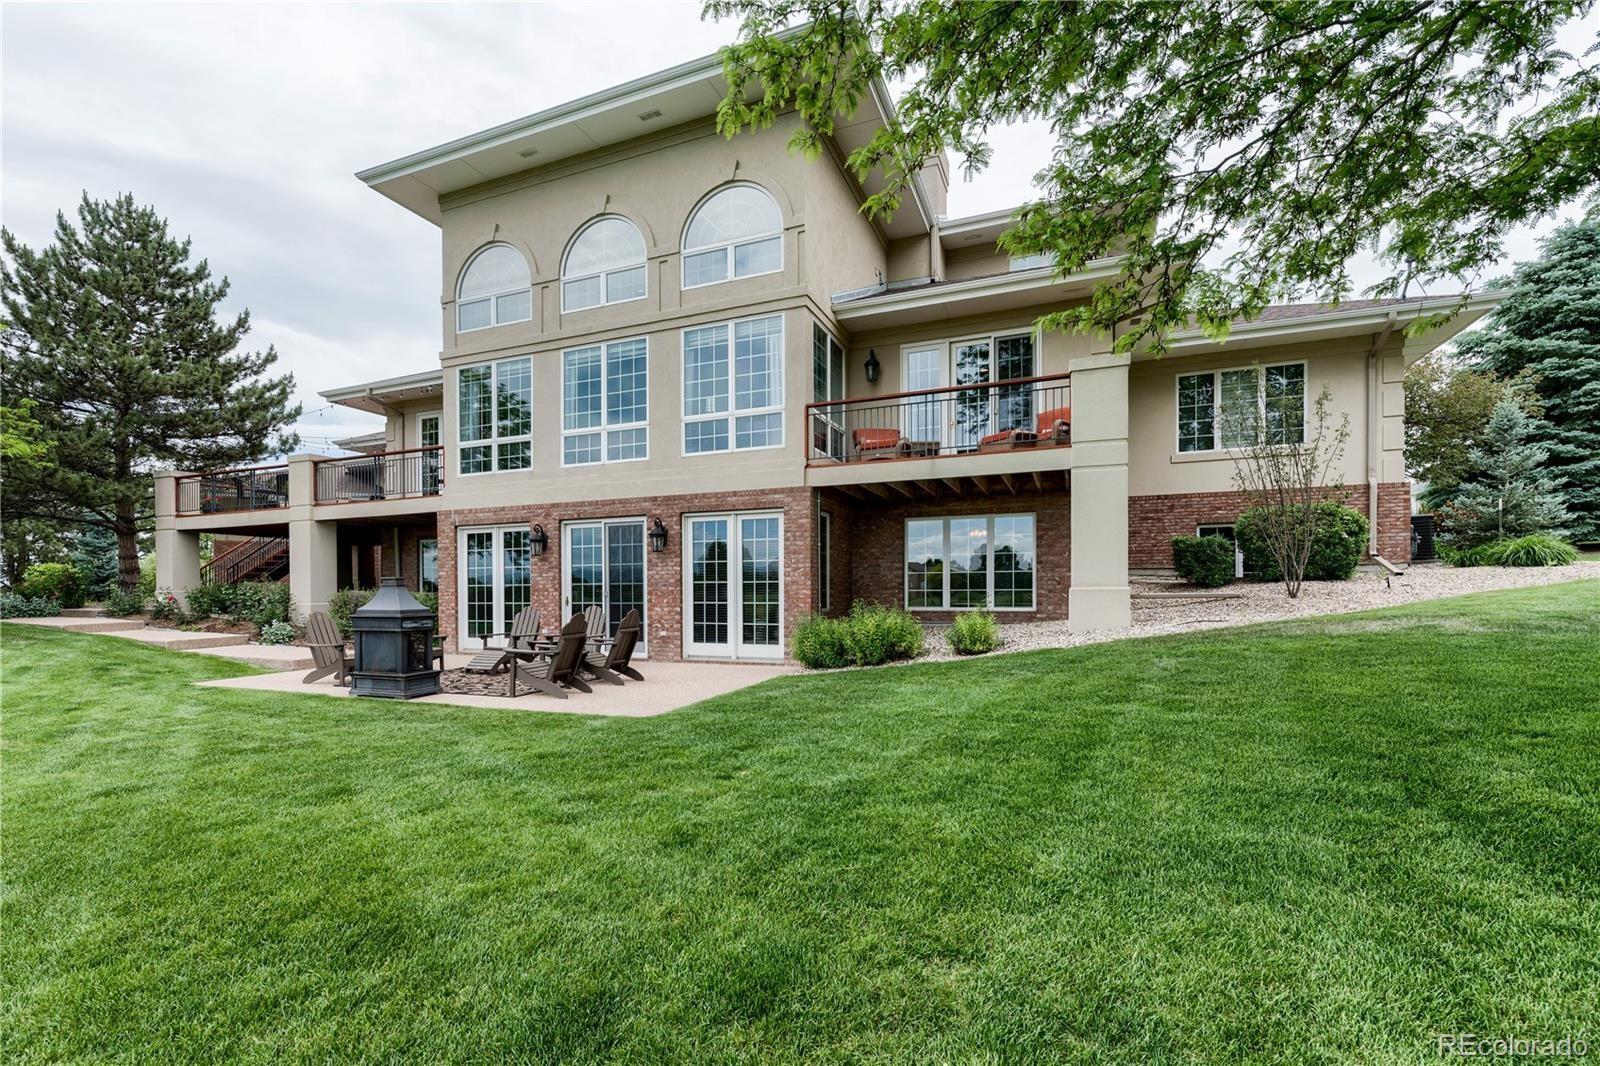 MLS# 2964584 - 38 - 5730 Ridgeway Drive, Fort Collins, CO 80528